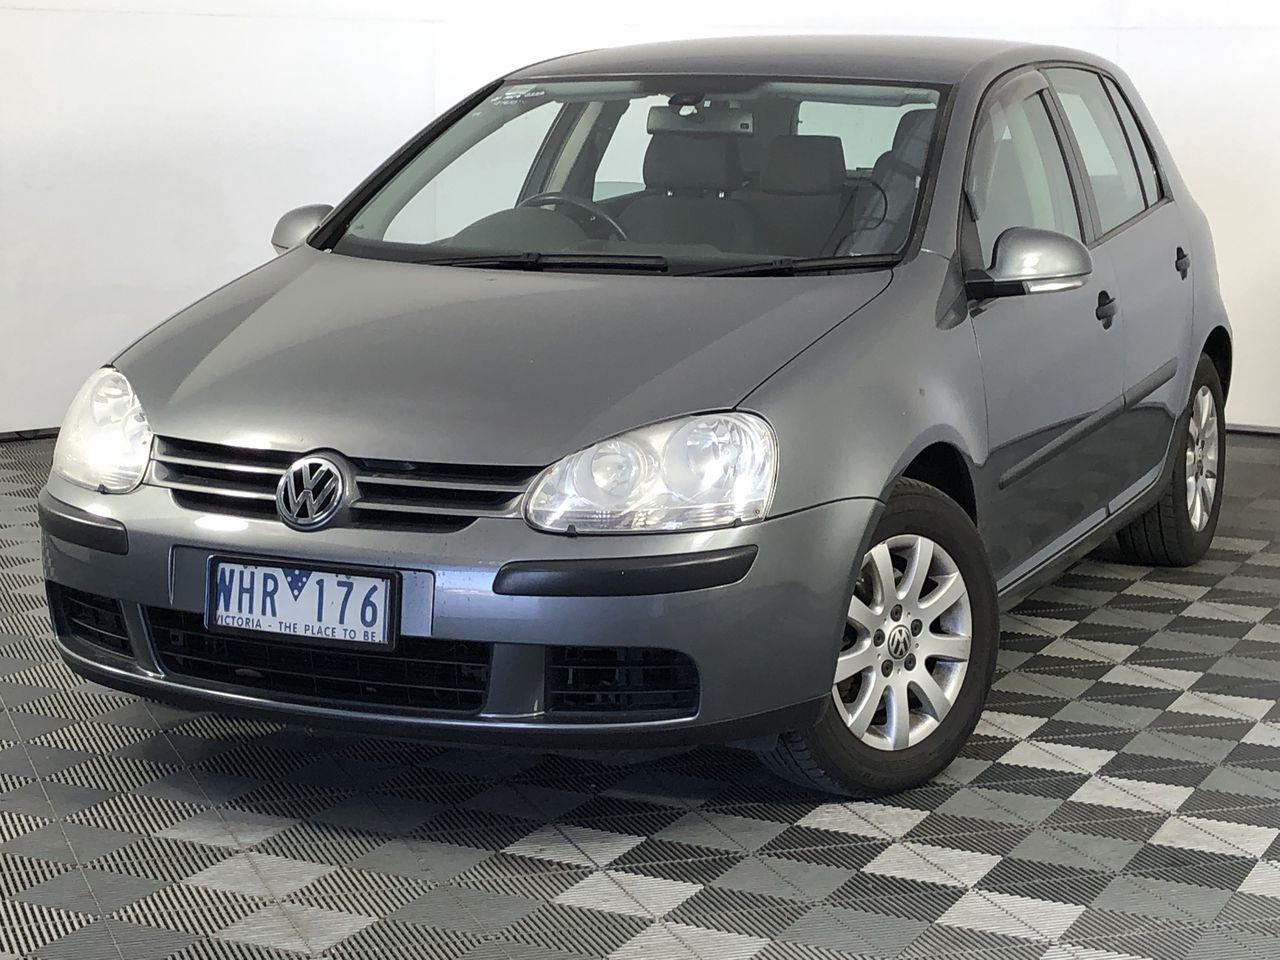 2005 Volkswagen Golf 2.0 FSI Comfortline 1k Automatic Hatchback